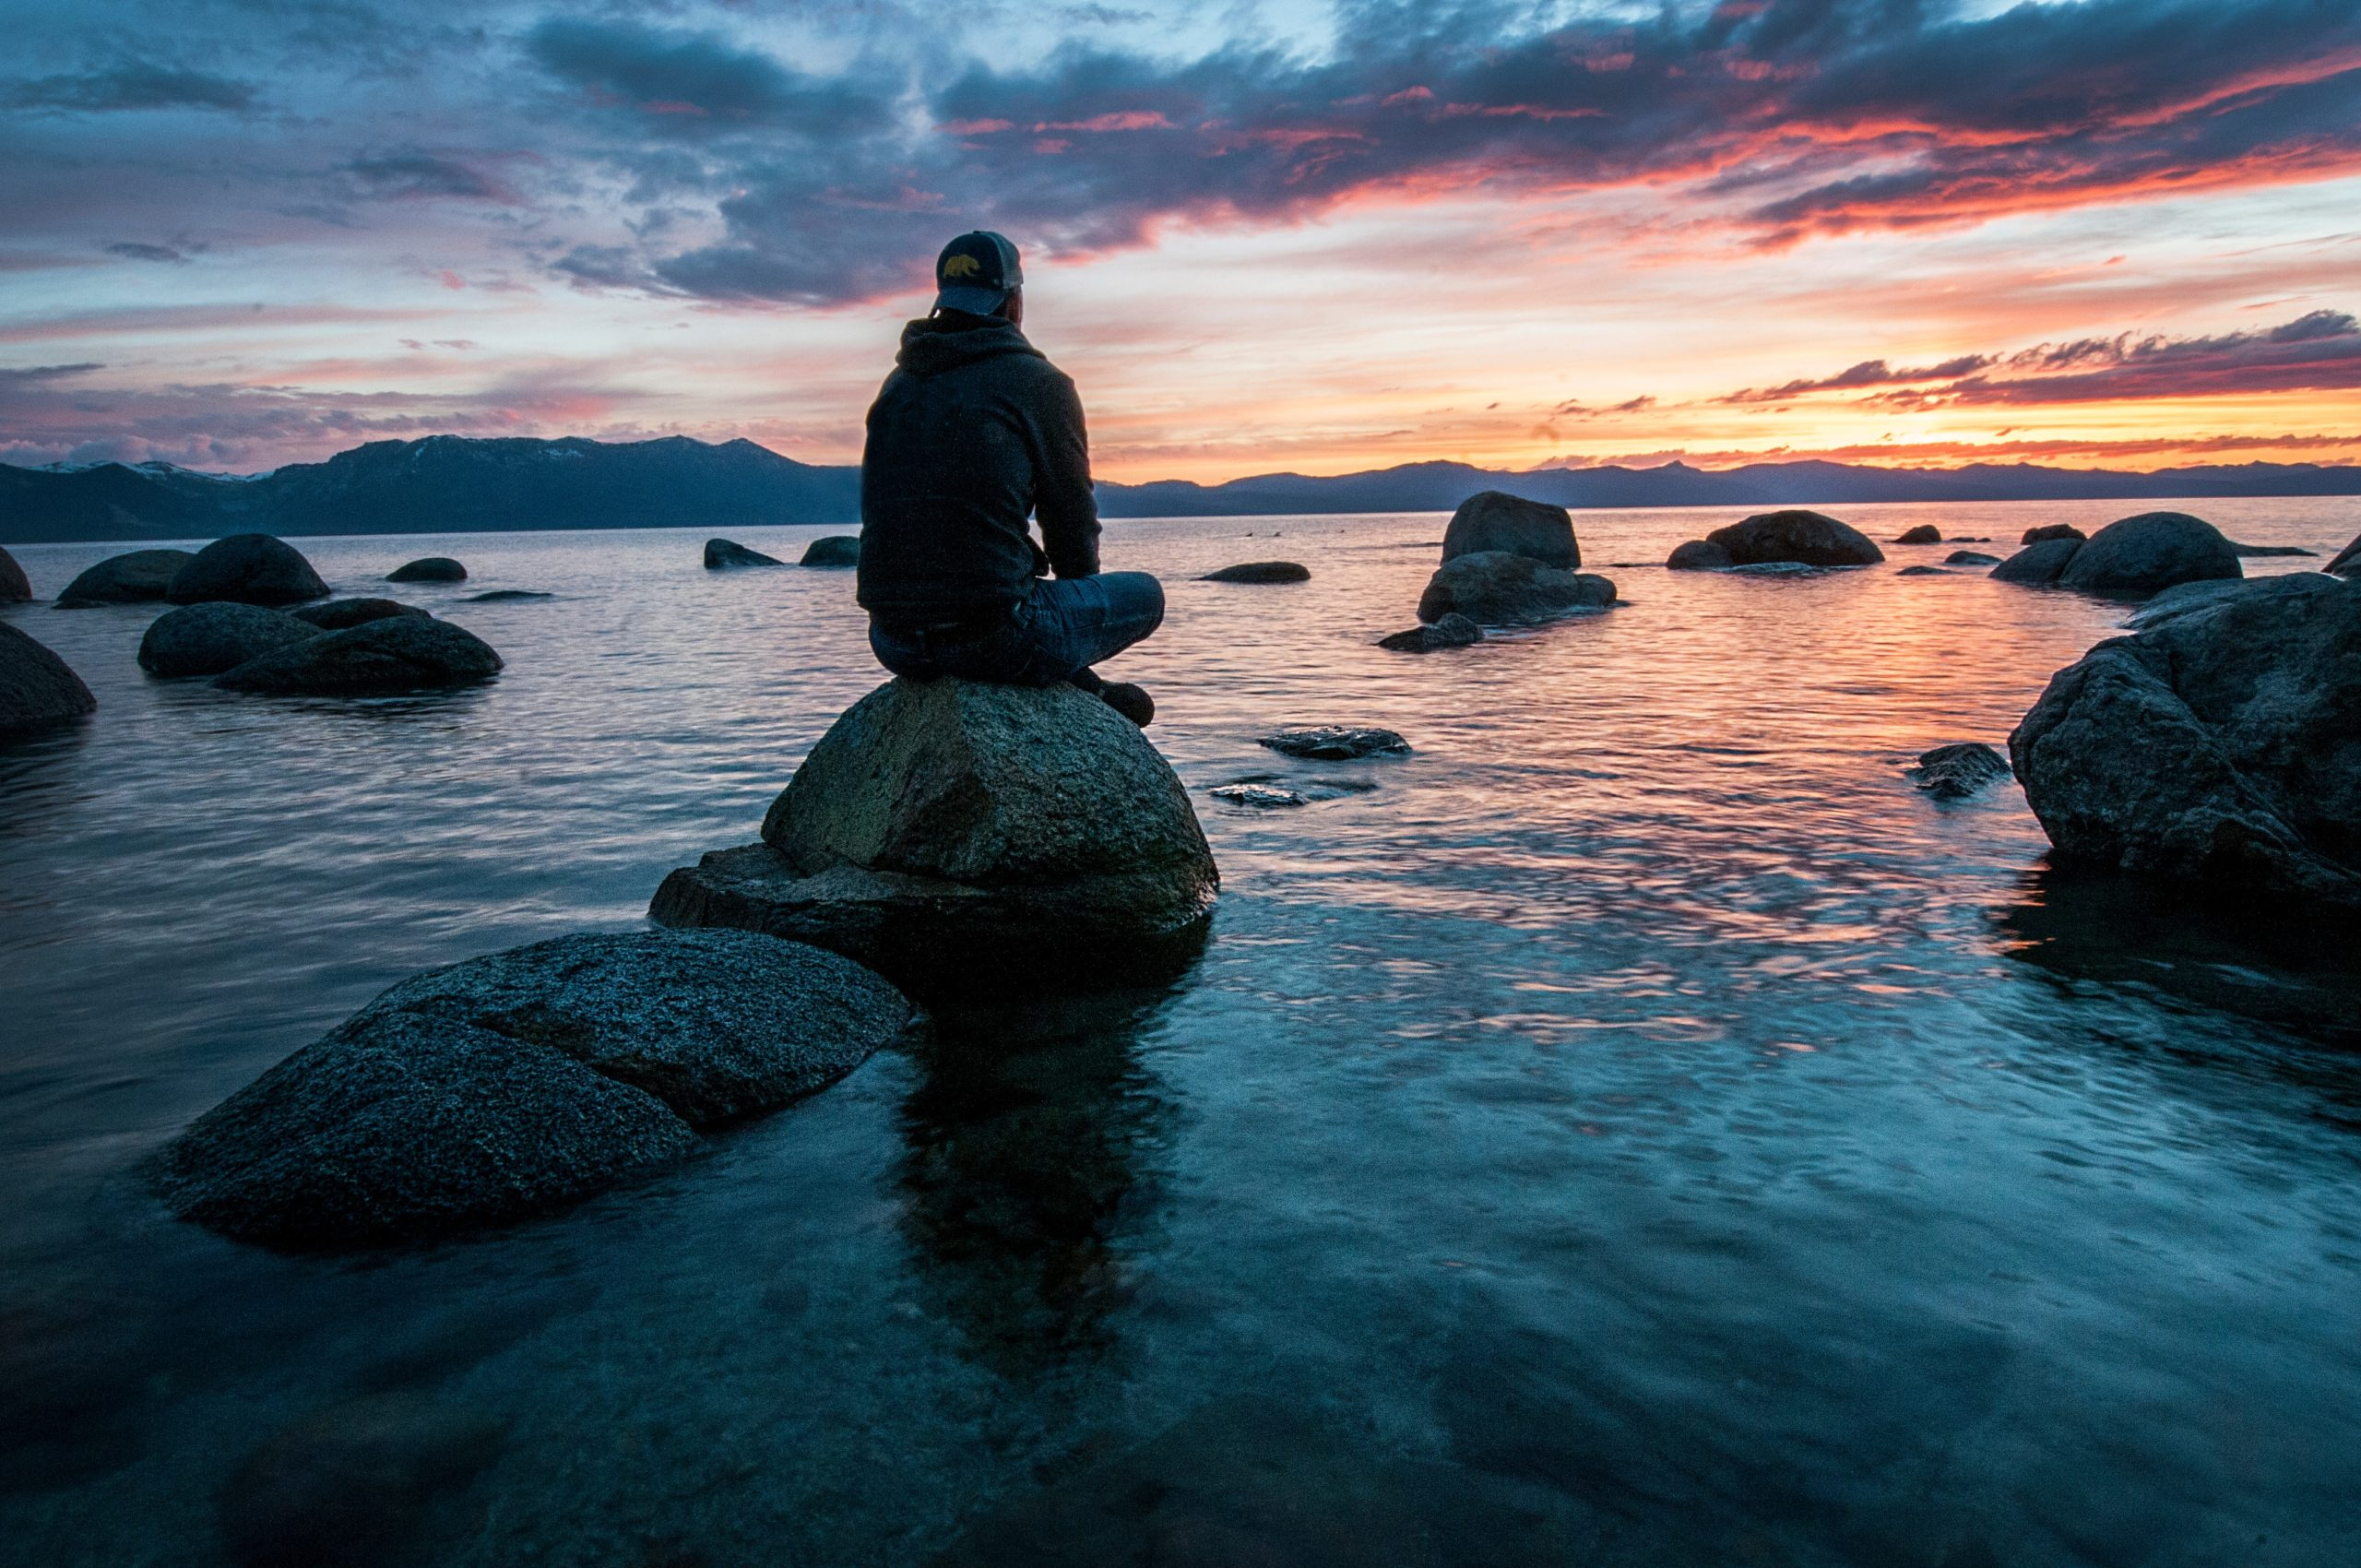 Lower Body Stress With Mindfulness Meditation